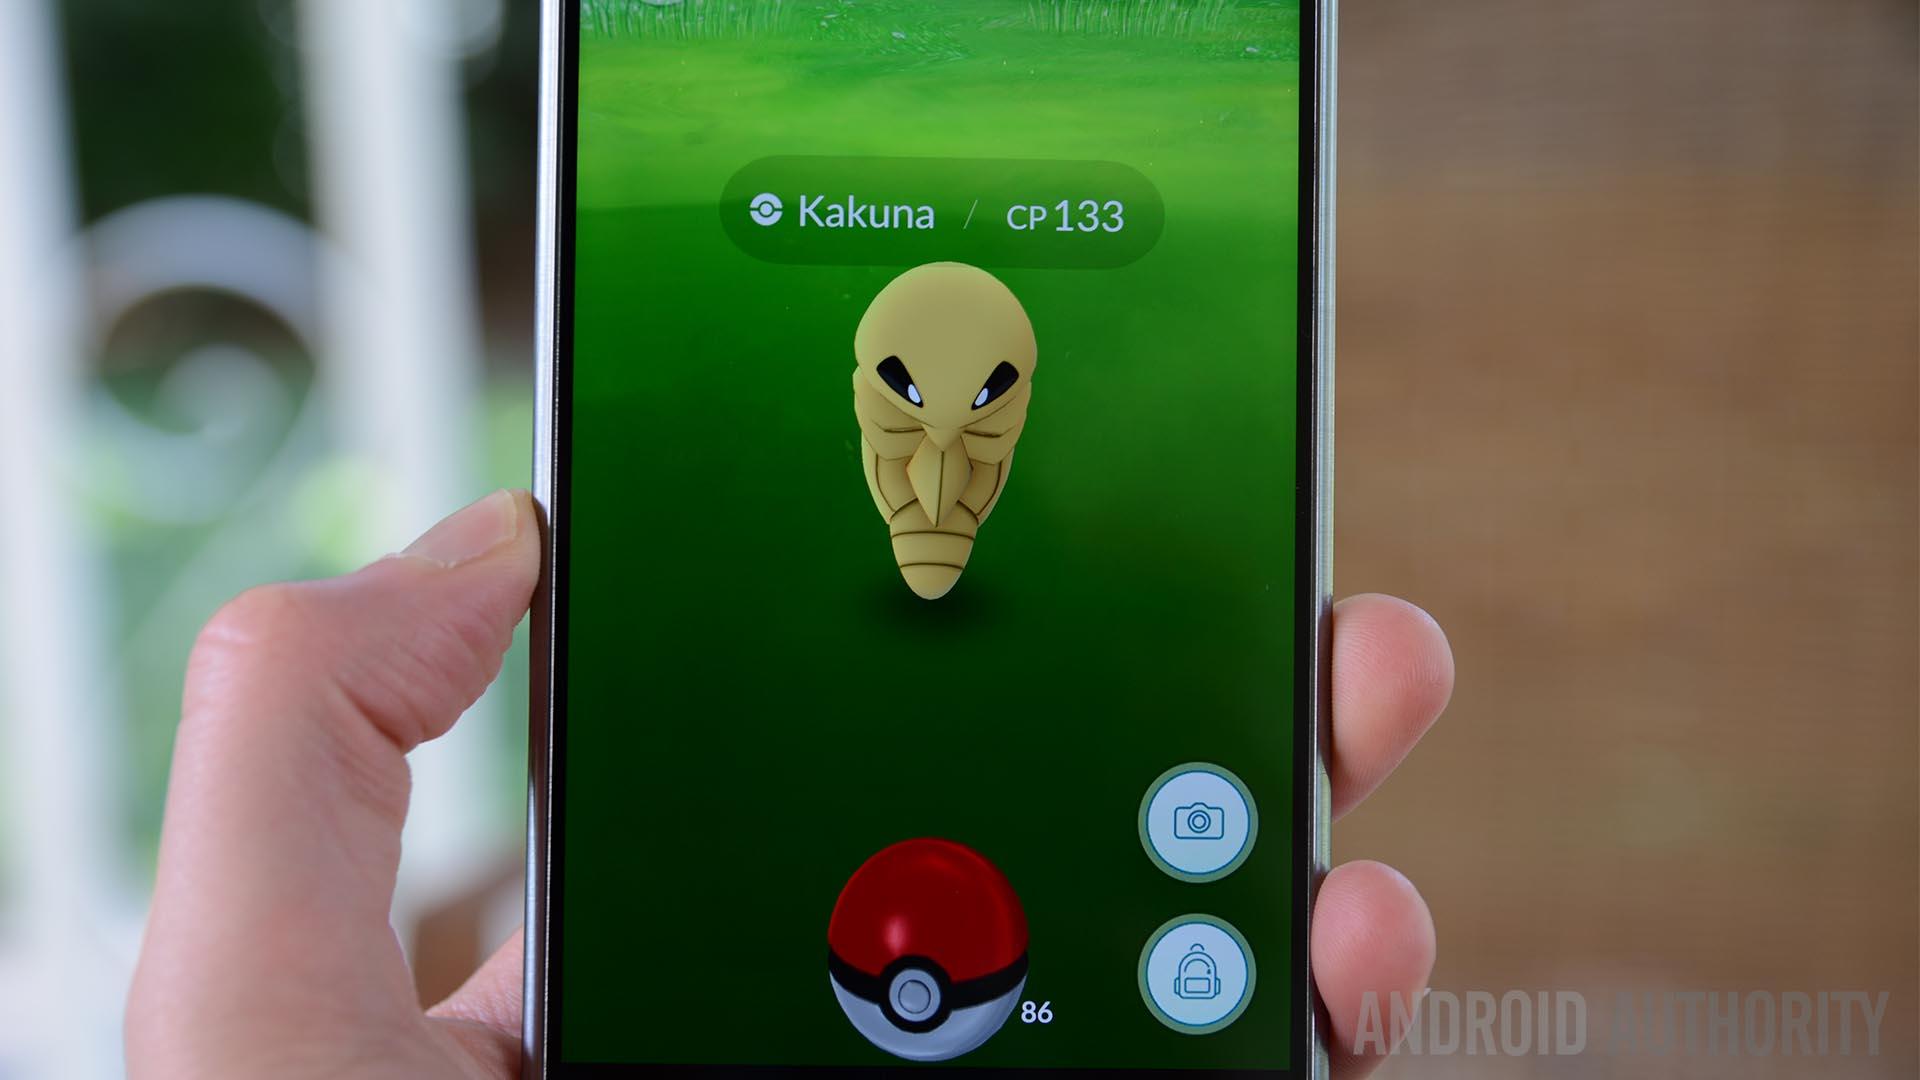 Pokemon Go Kakuna Capture screen